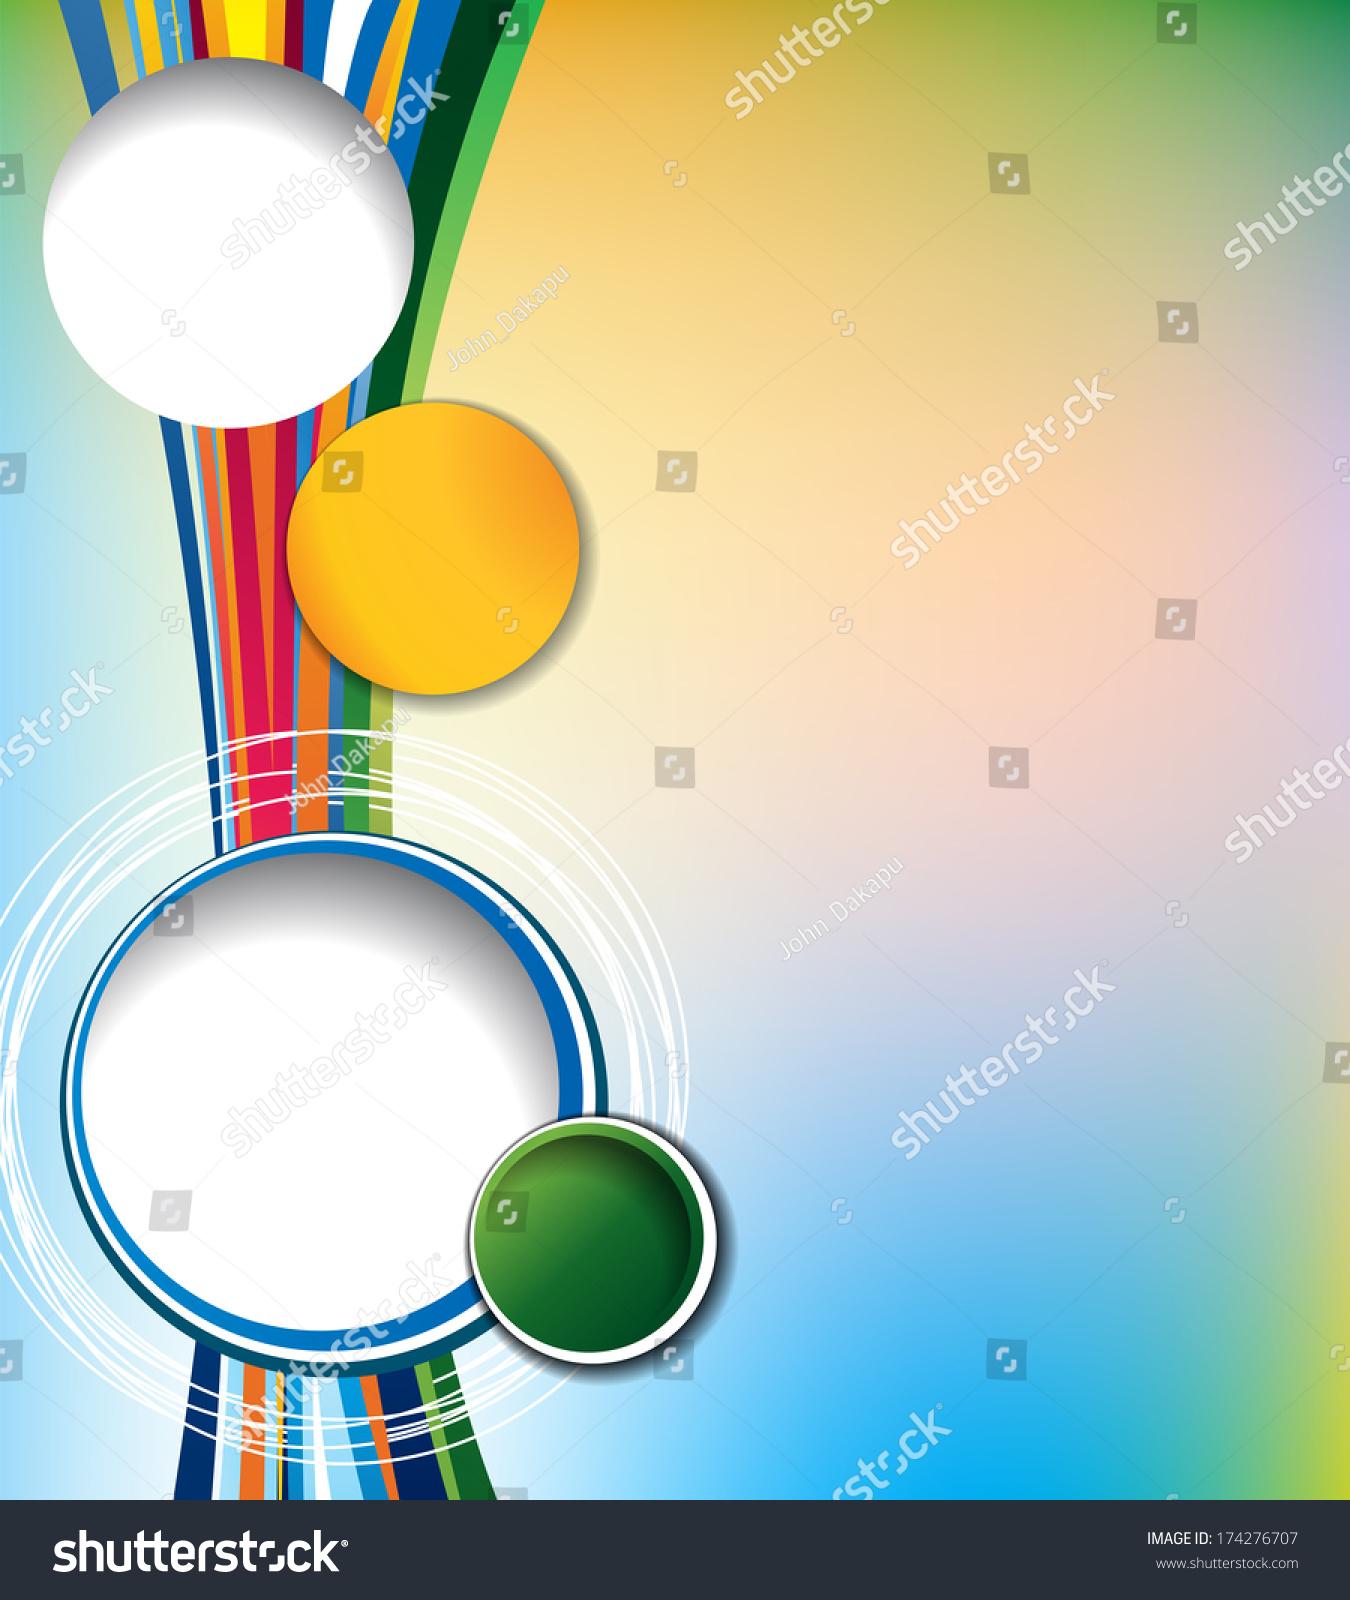 Brochure design content background design layout stock for Brochure background templates